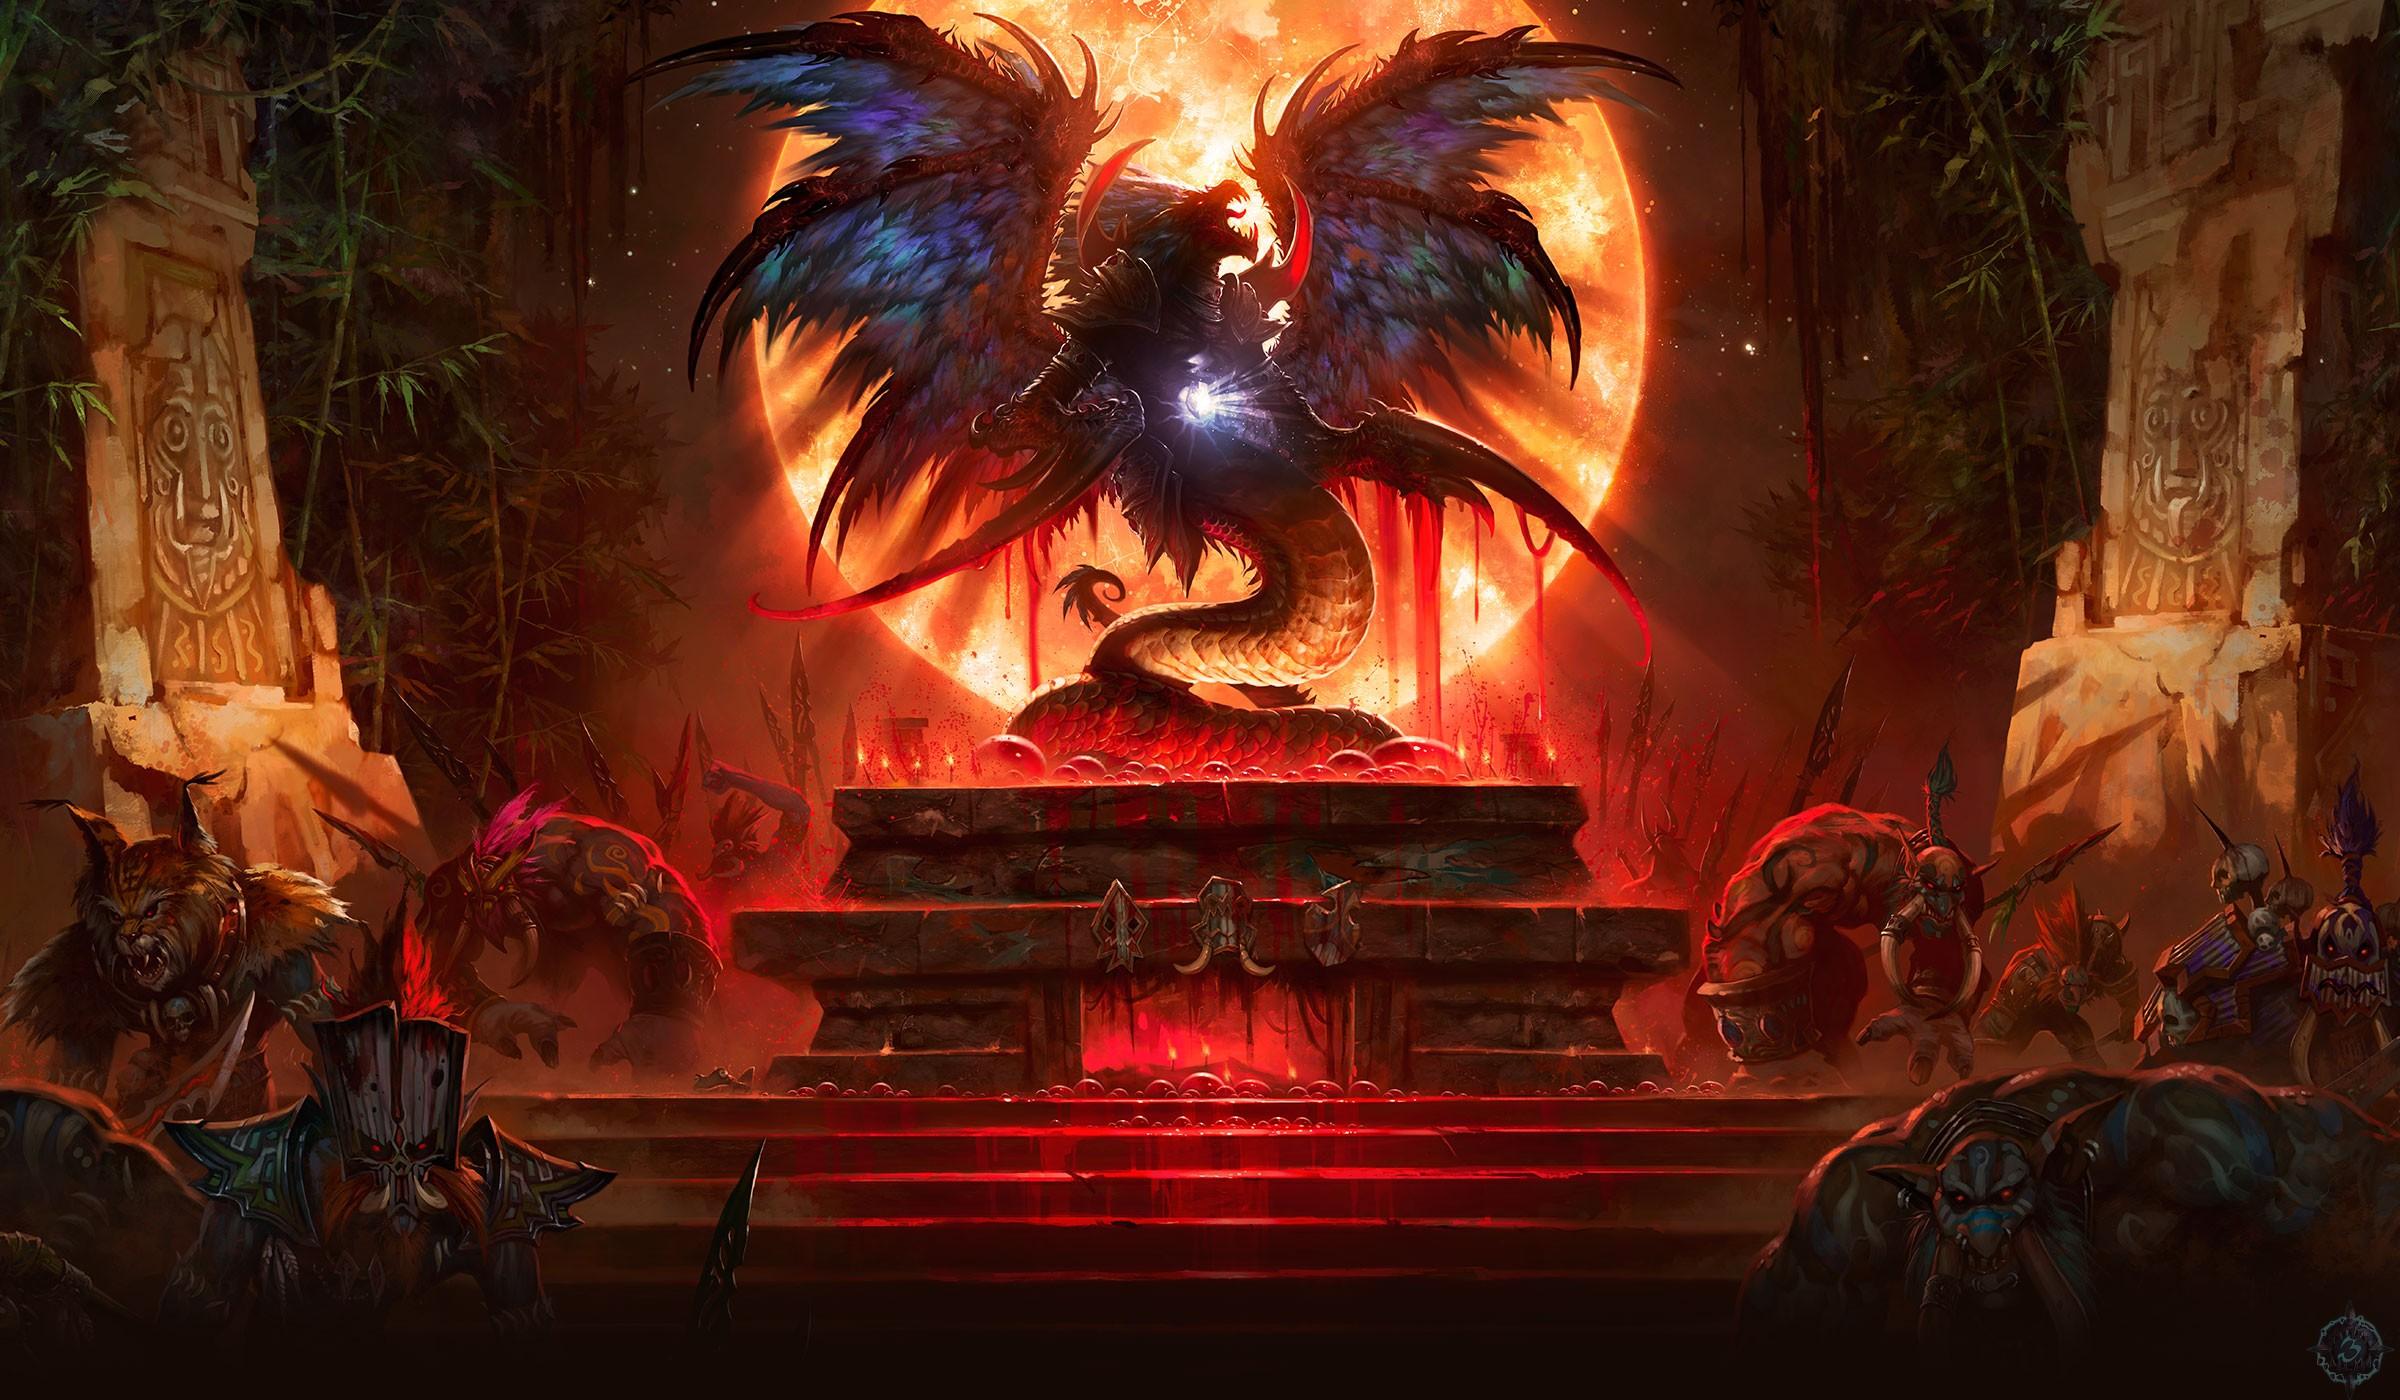 Ascensão dos Zandalari | World of WarCraft, WarCraft, wow, azeroth, lore